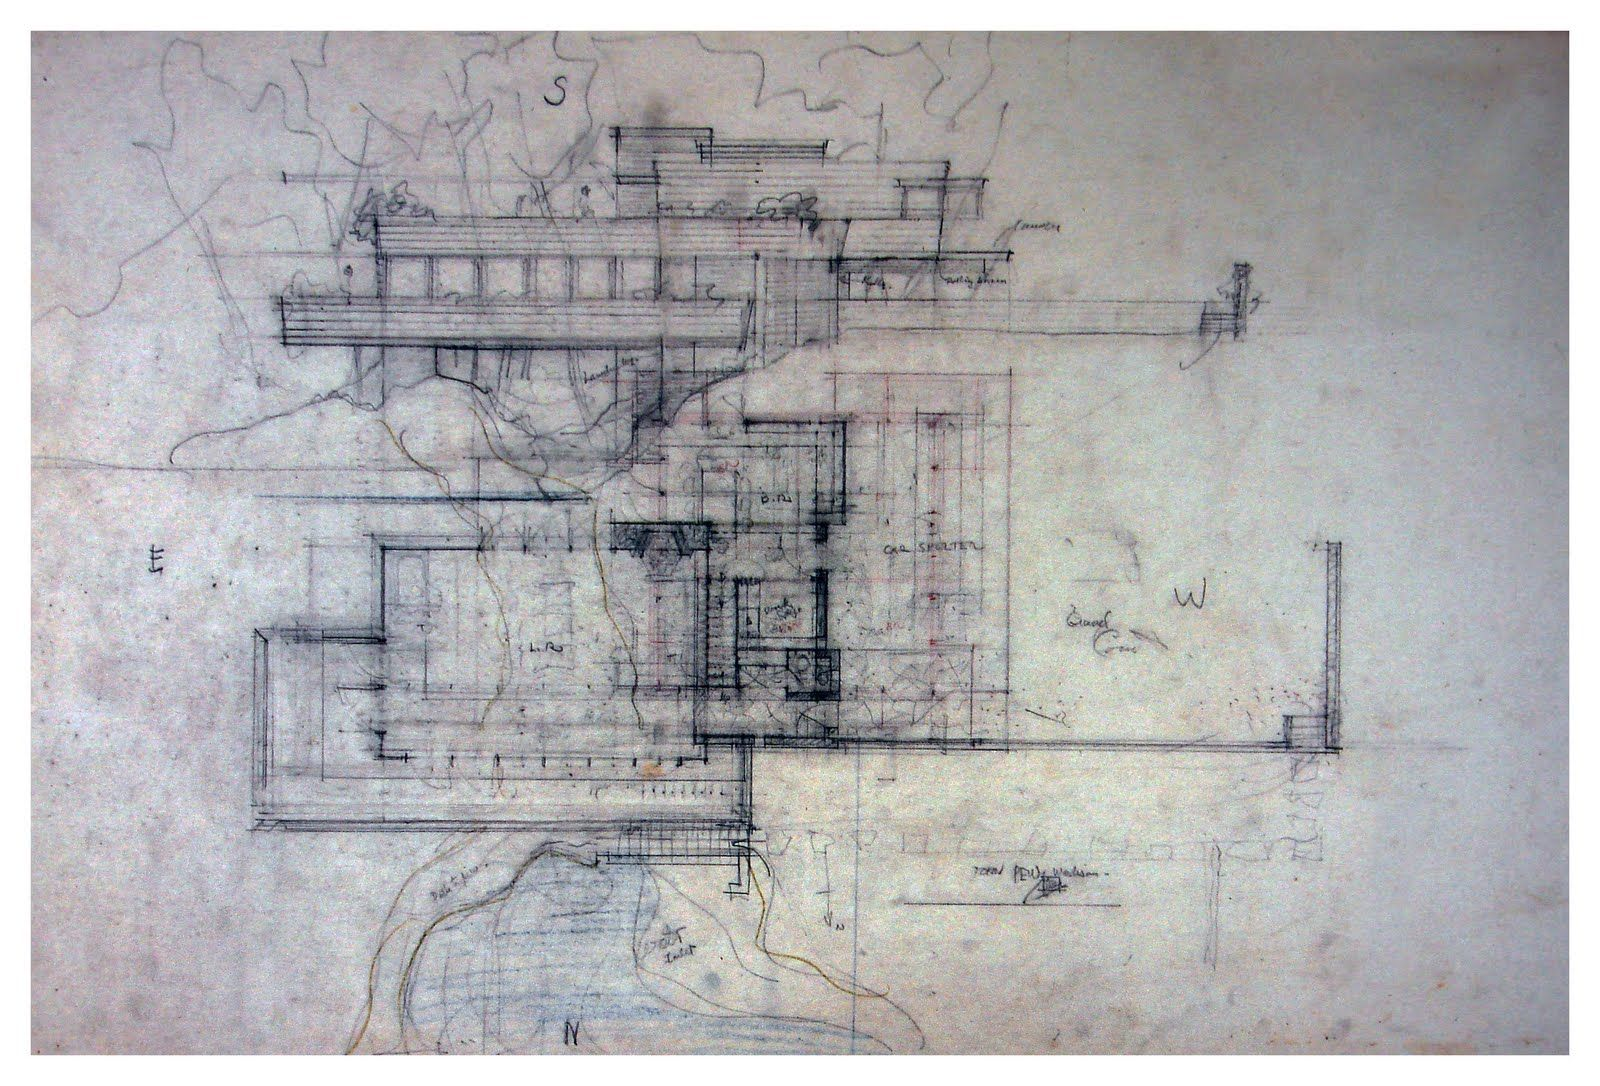 Pew House Frank Wright Google Search Dibujo Arquitectonico Arquitectura Croquis Dibujo